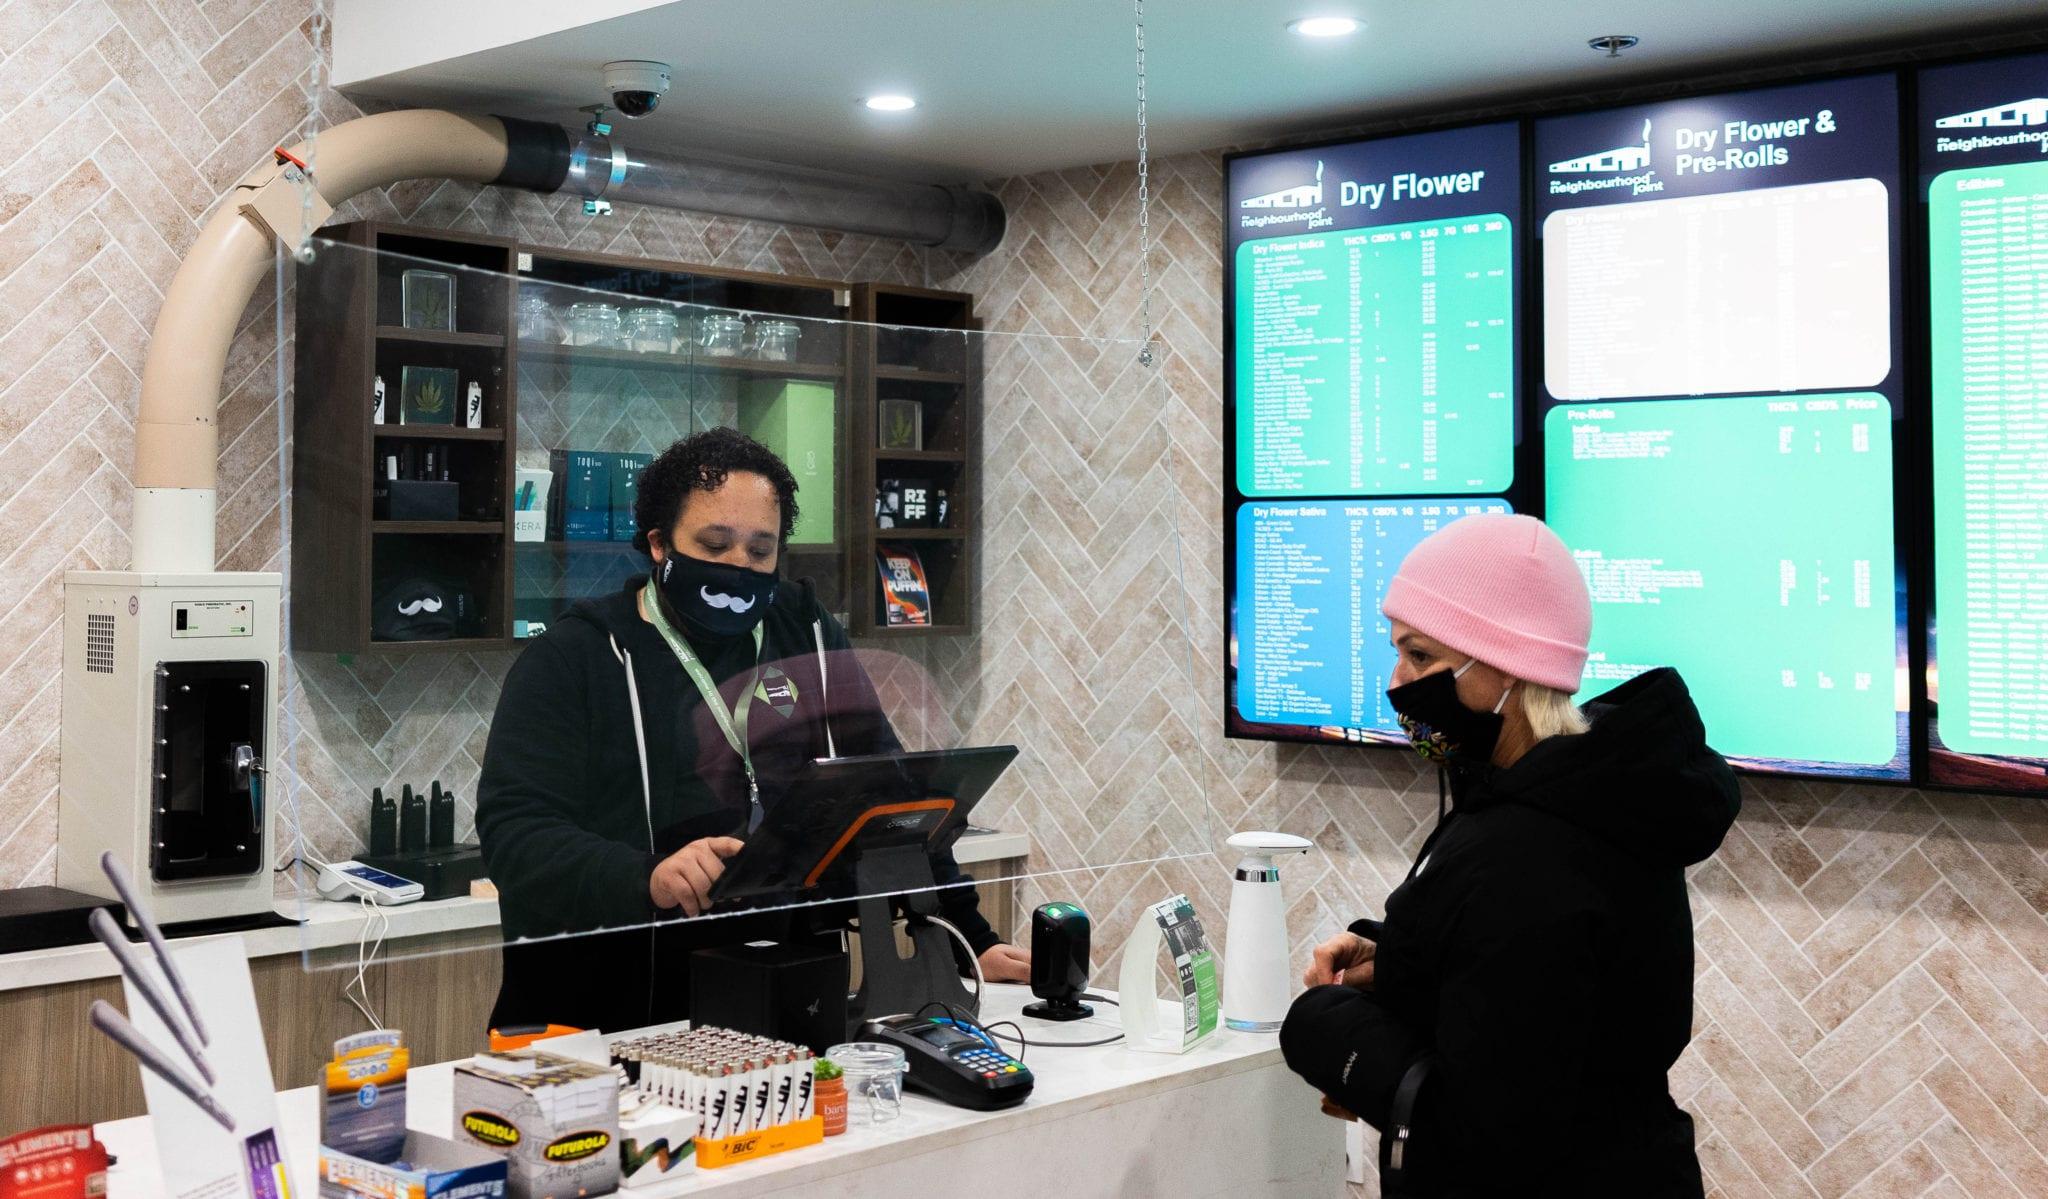 Canadian cannabis sales grow 120% in 2020, reaching $2.6B